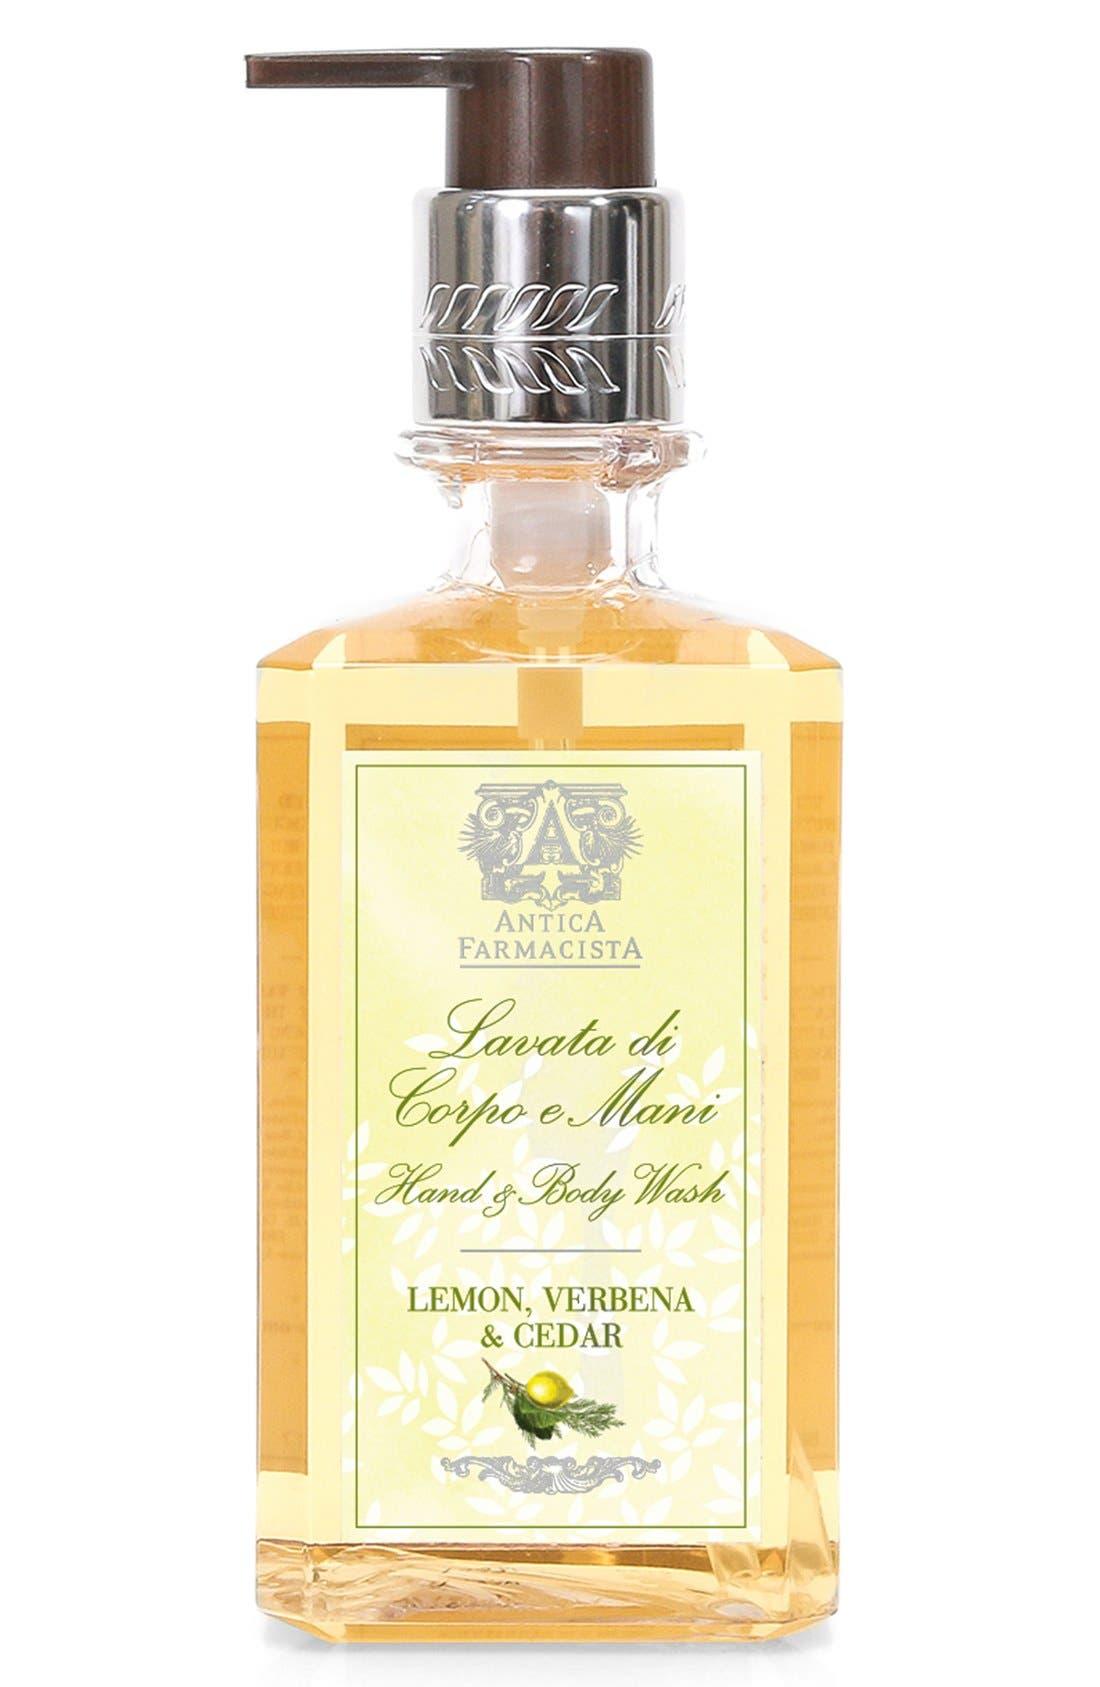 Antica Farmacista 'Lemon, Verbena & Cedar' Hand Wash